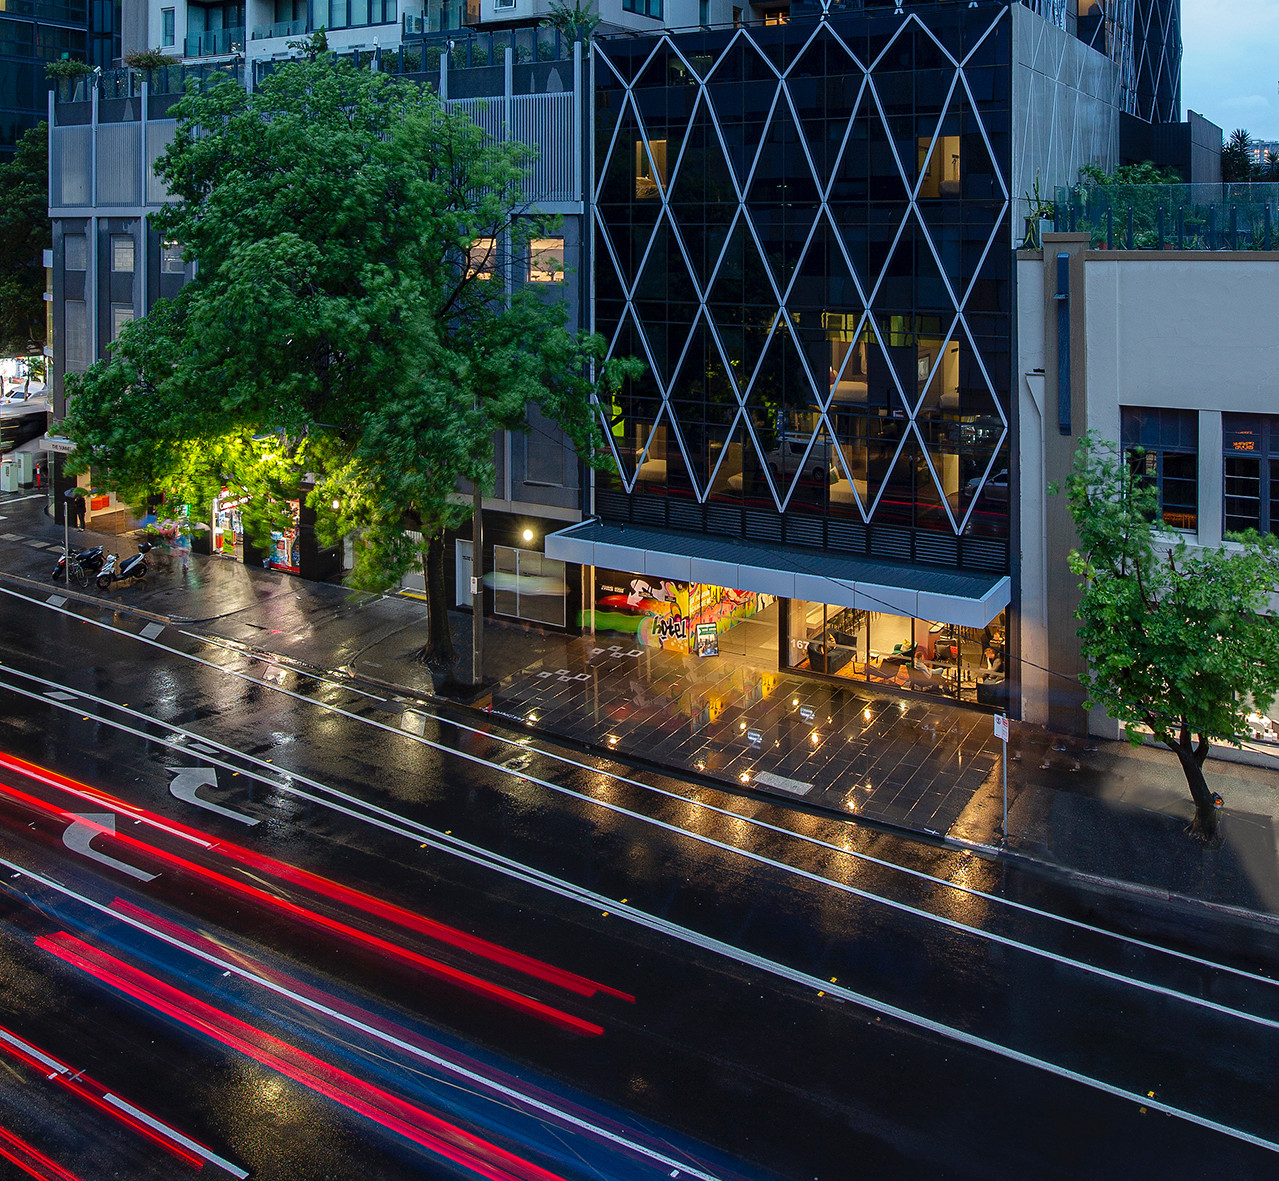 Ink Hotel Street View